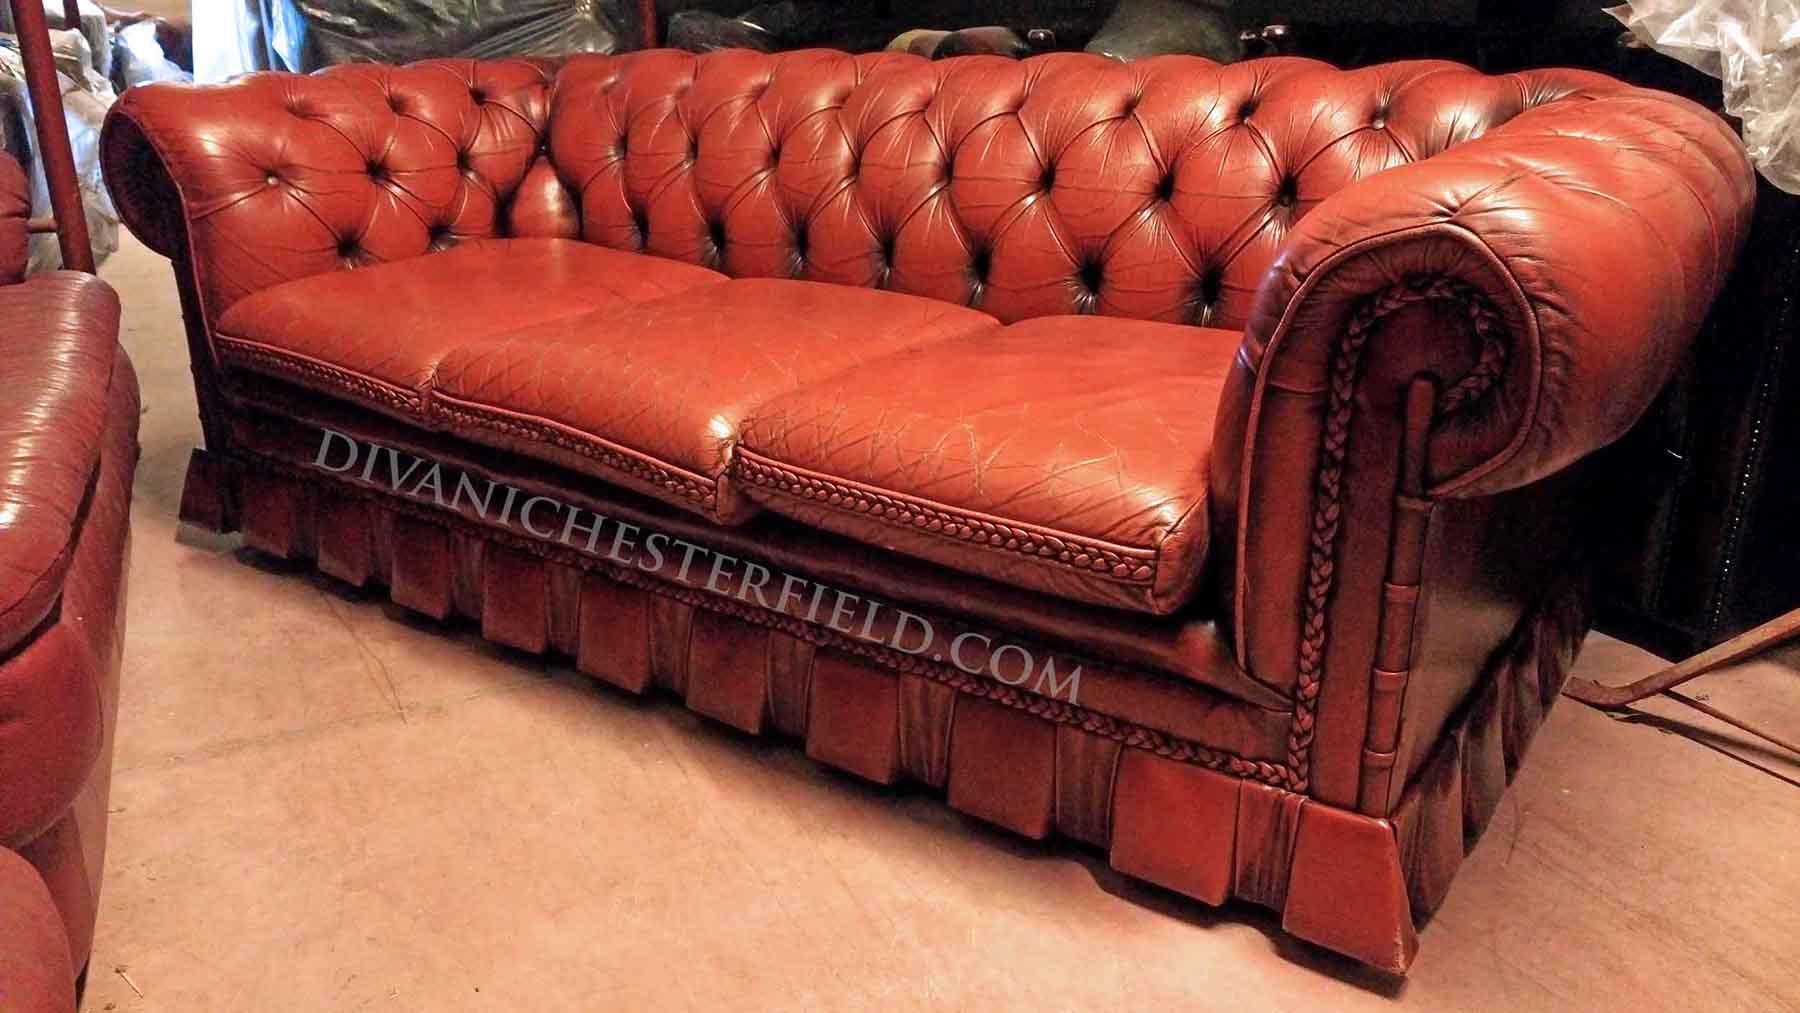 Divani Chester Prezzi : Divani chesterfield usati pelli vintage originali inglesi